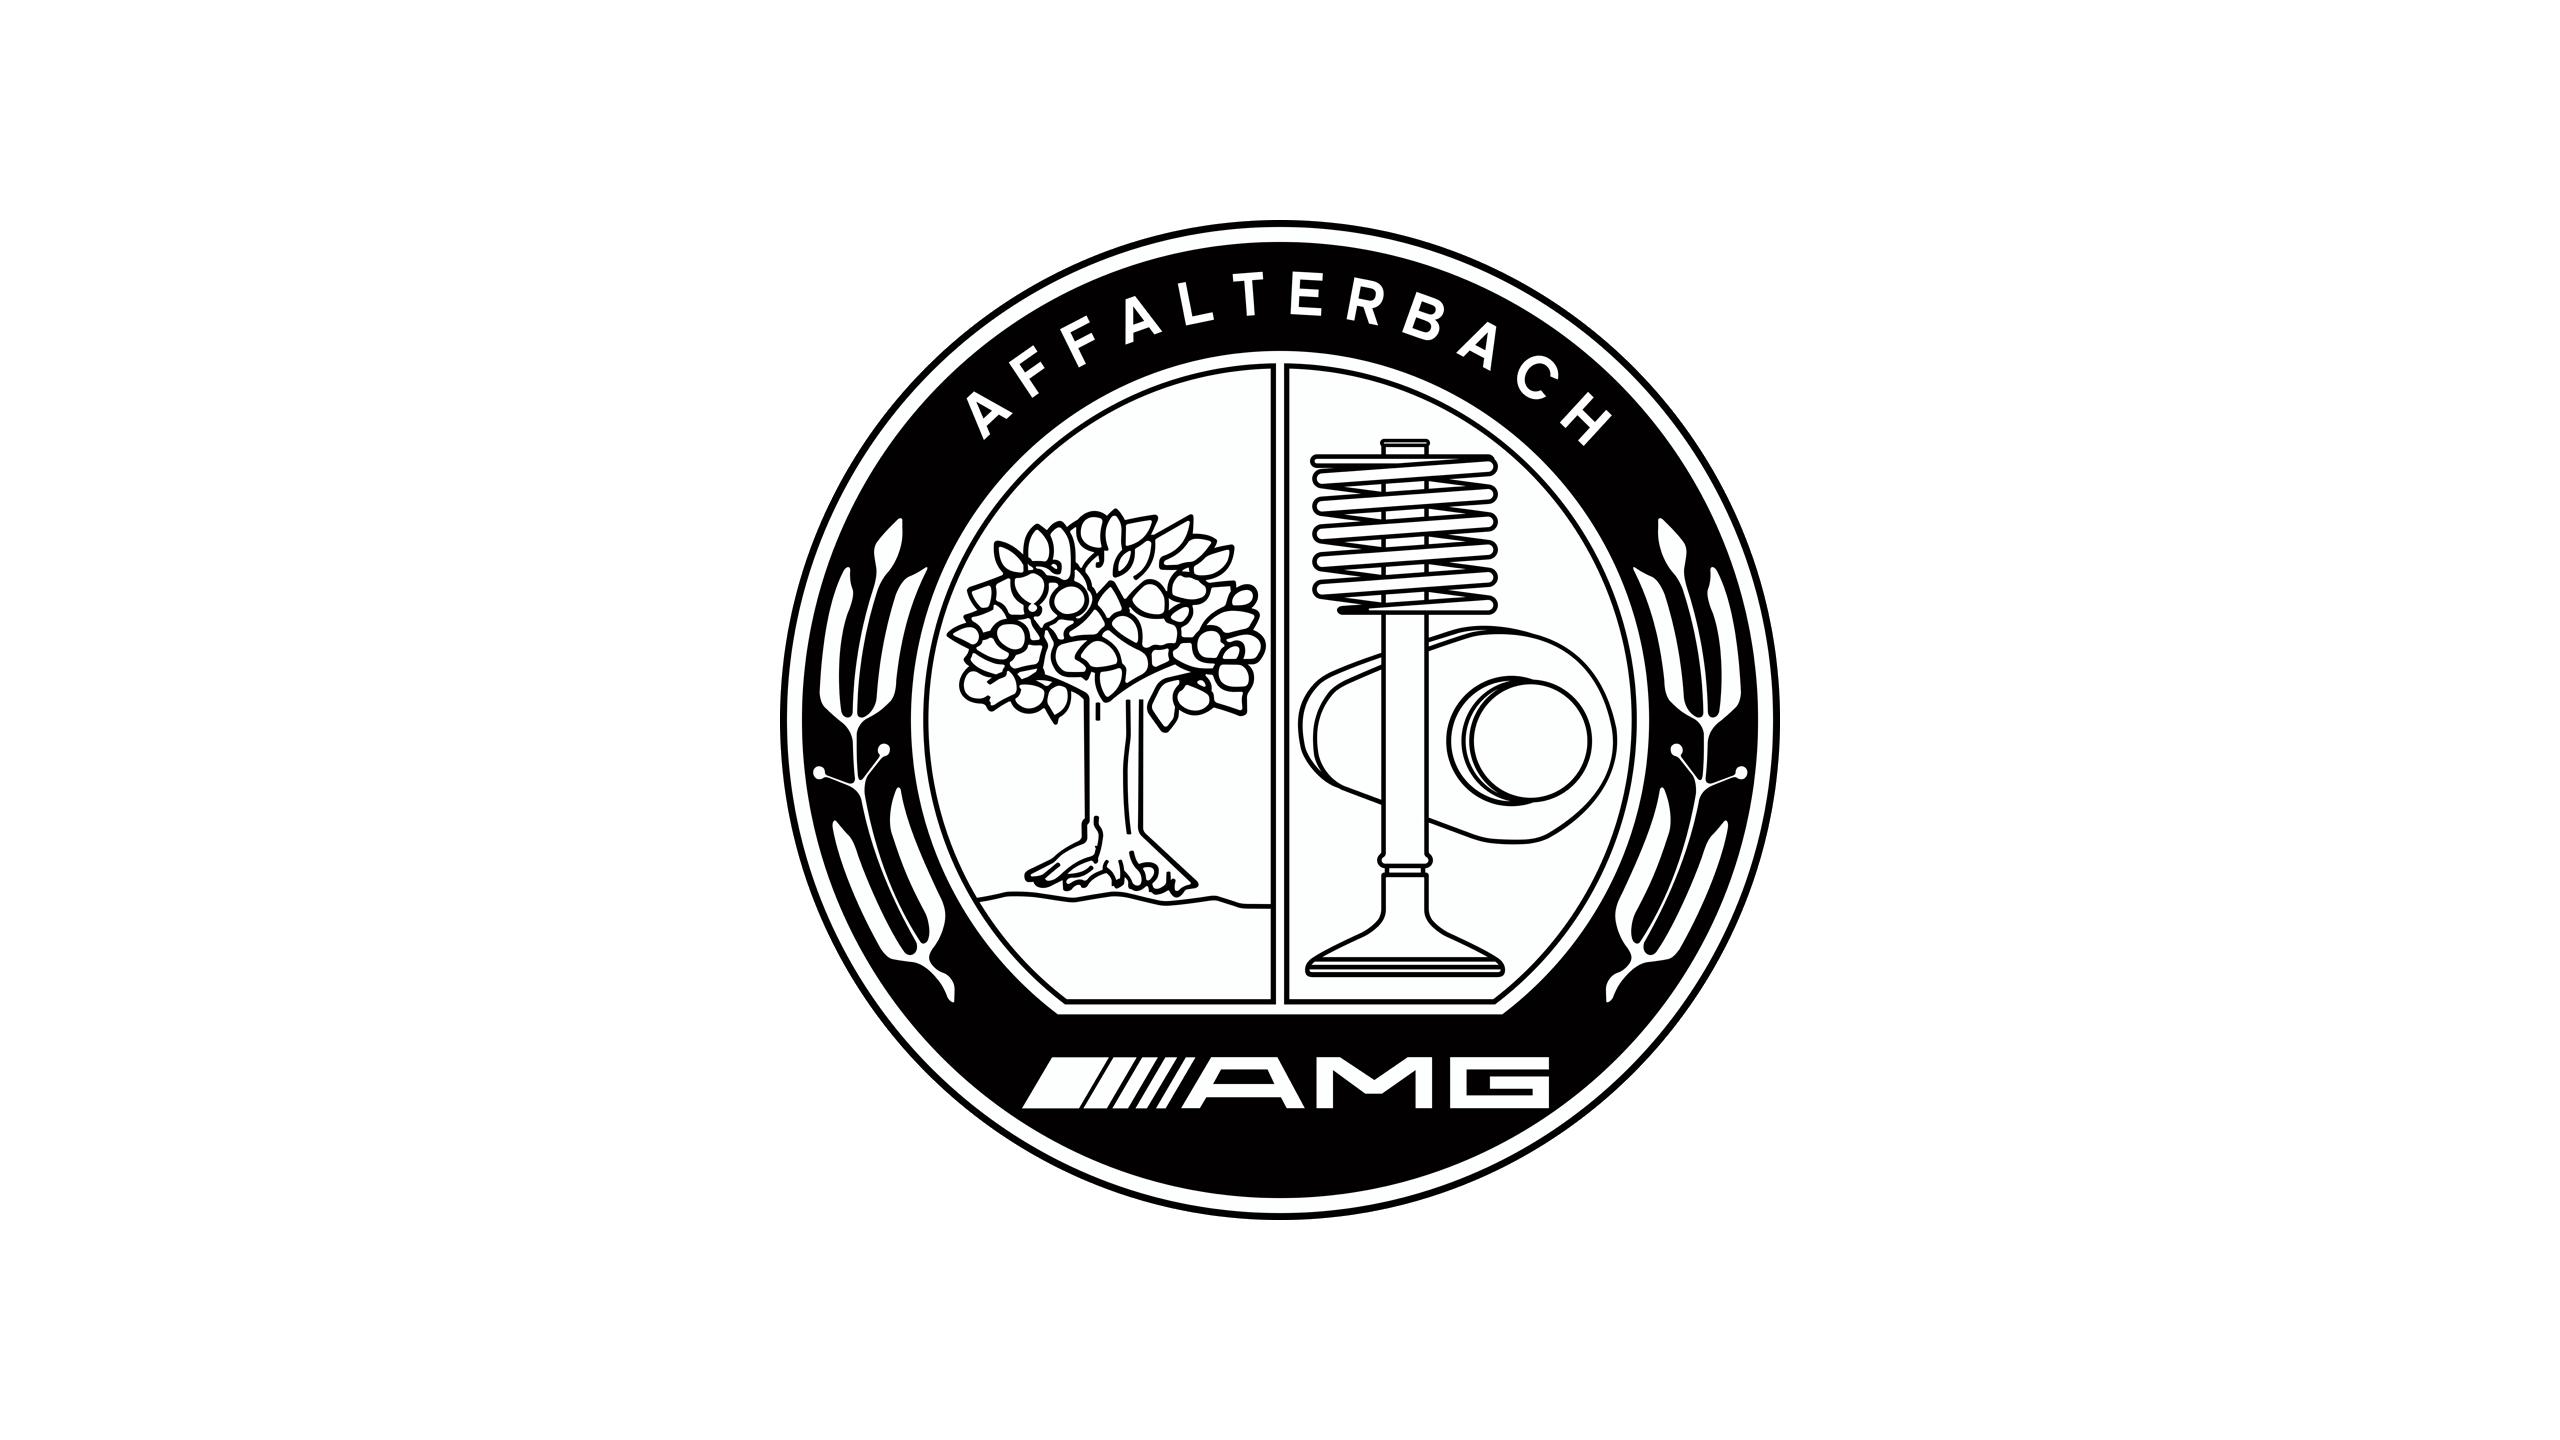 Mercedes Benz Amg Logo wwwpixsharkcom   Images 2560x1440